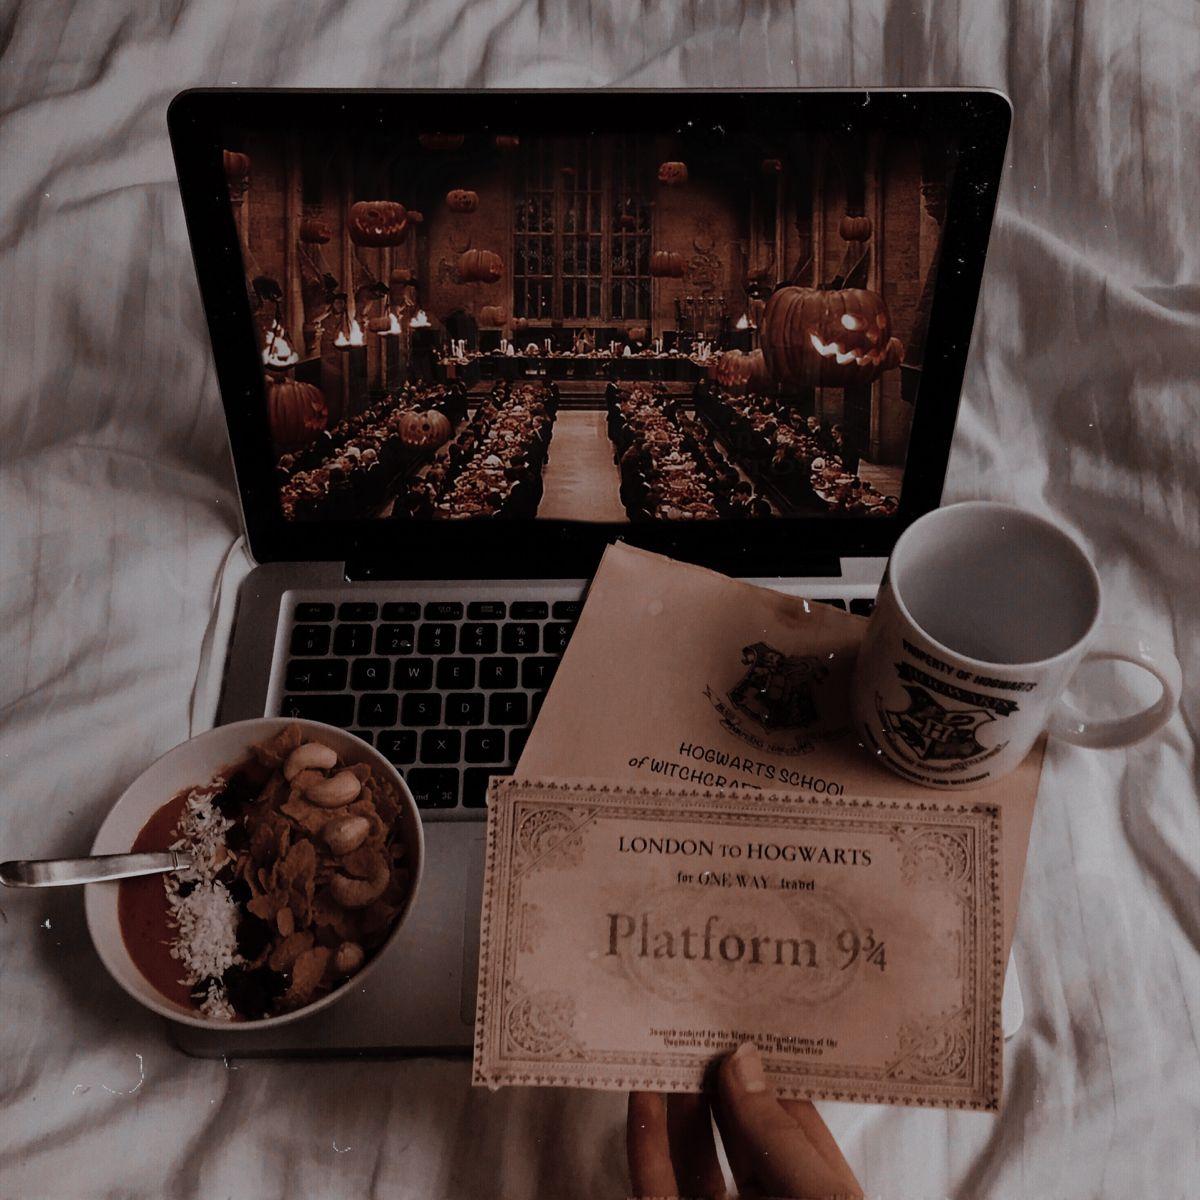 Pin By Dreamer On Aesthetic Seasons Holidays Hogwarts Potterhead Seasons